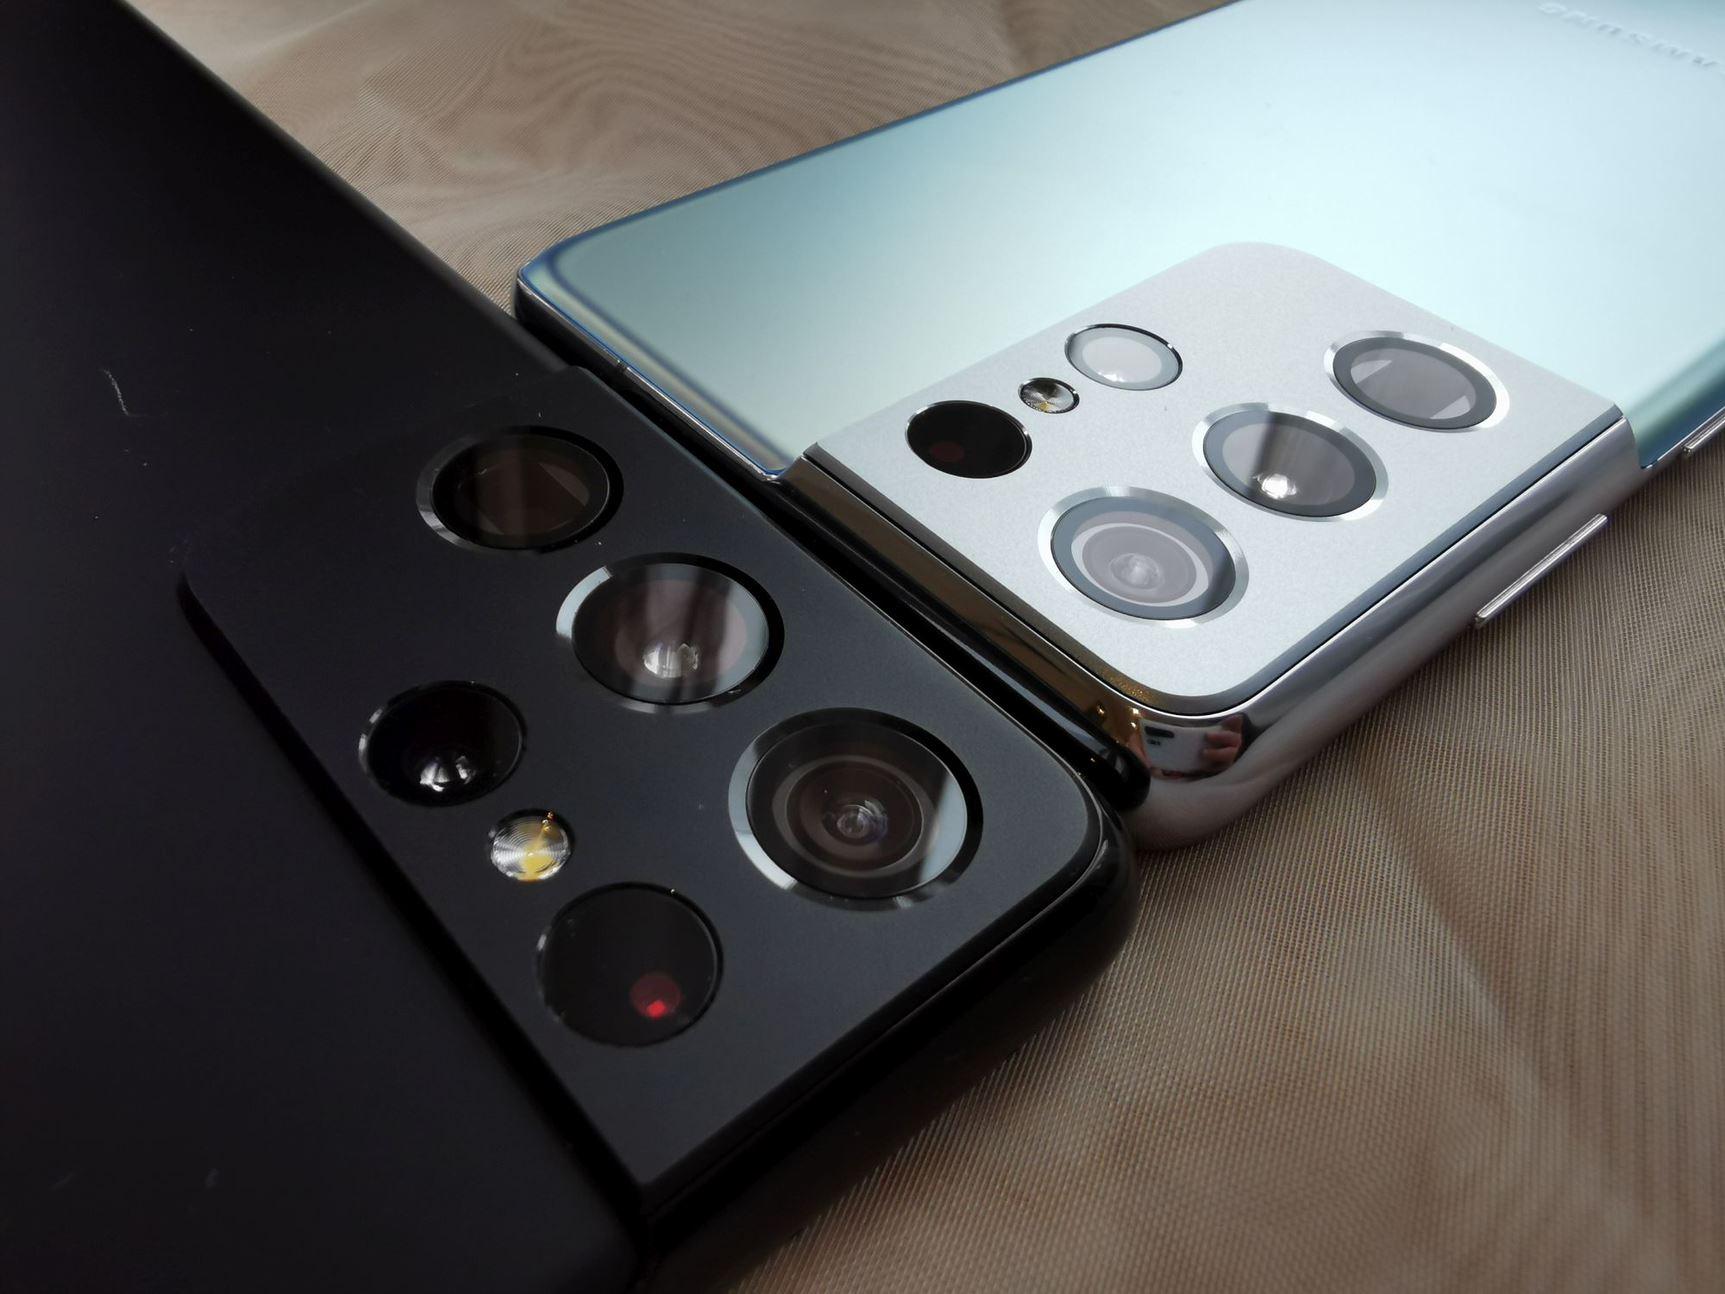 Samsung Galaxy S21 Ultra tel 058